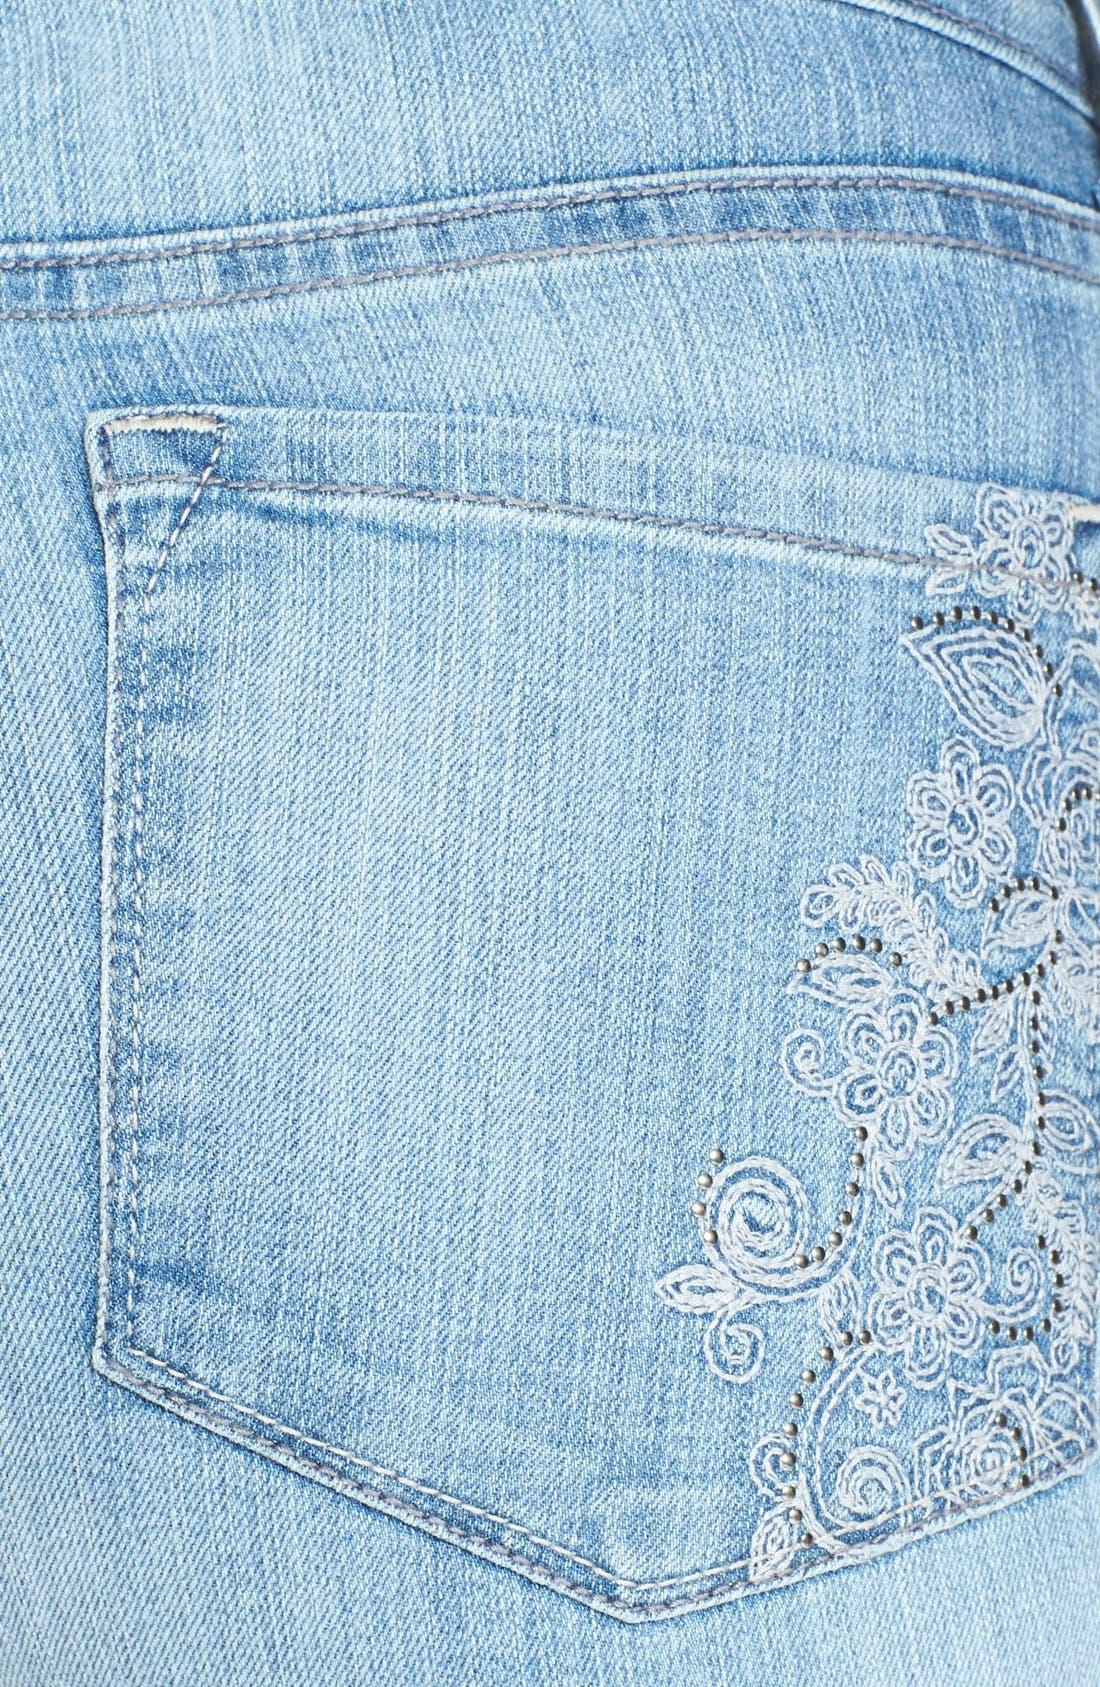 Alternate Image 3  - NYDJ 'Barbara' Stretch Bootcut Jeans (Palos Verdes)